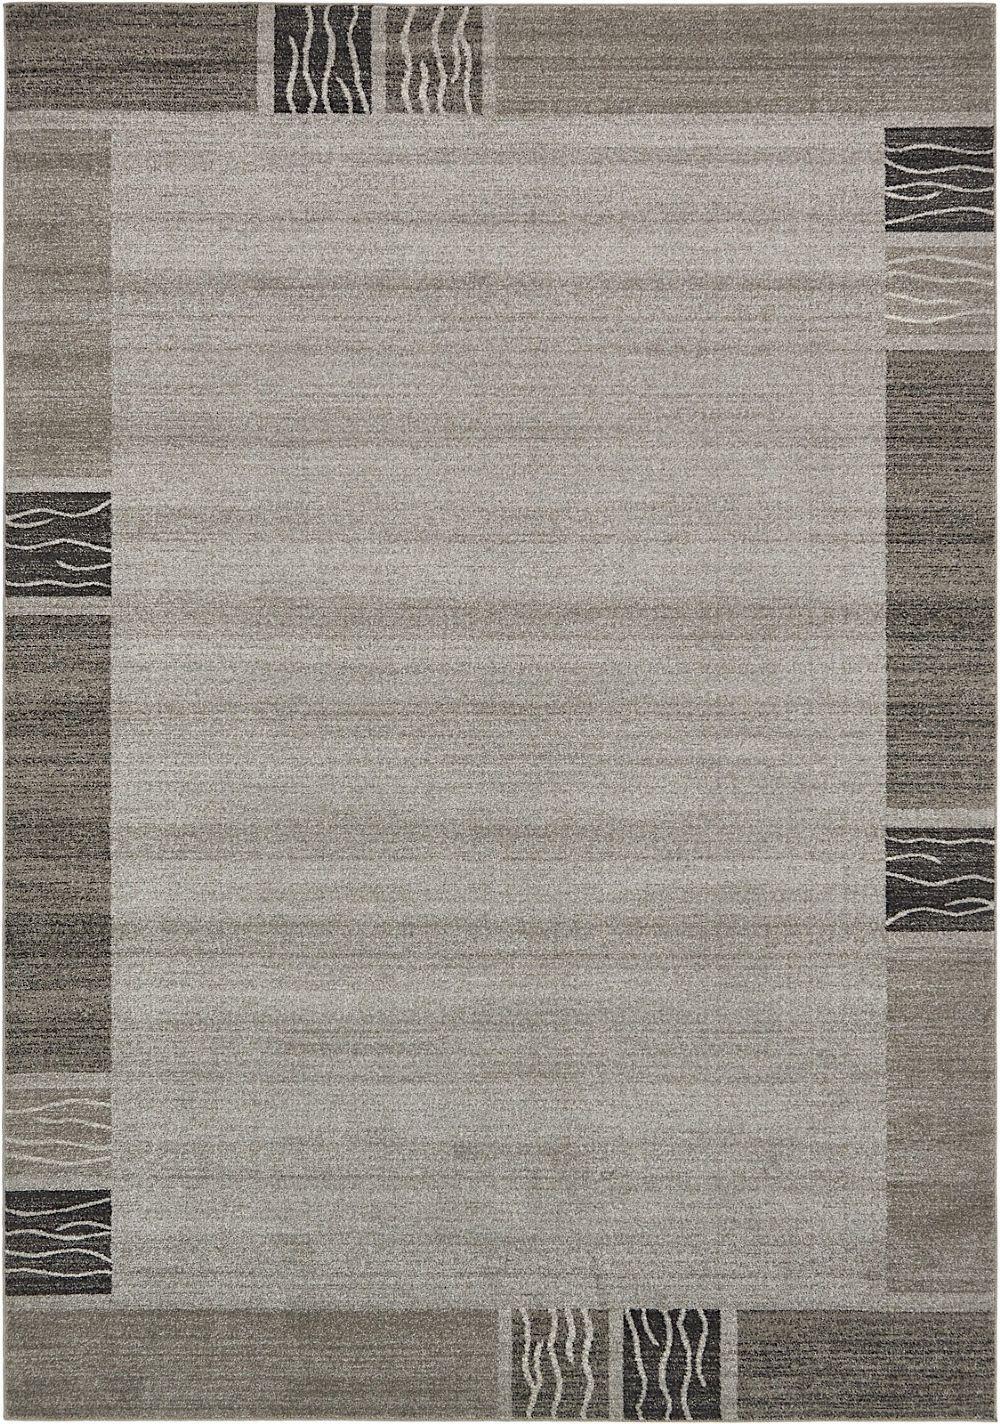 desdemona contemporary area rug collection